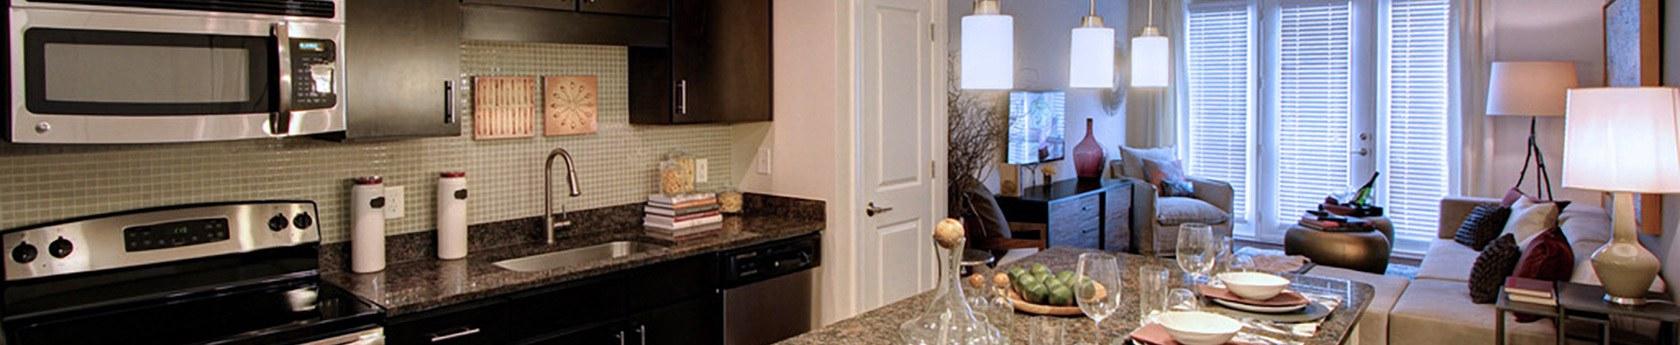 Studio 1 2 bedroom apartments in durham nc berkshire ninth street for 2 bedroom apartments in durham nc